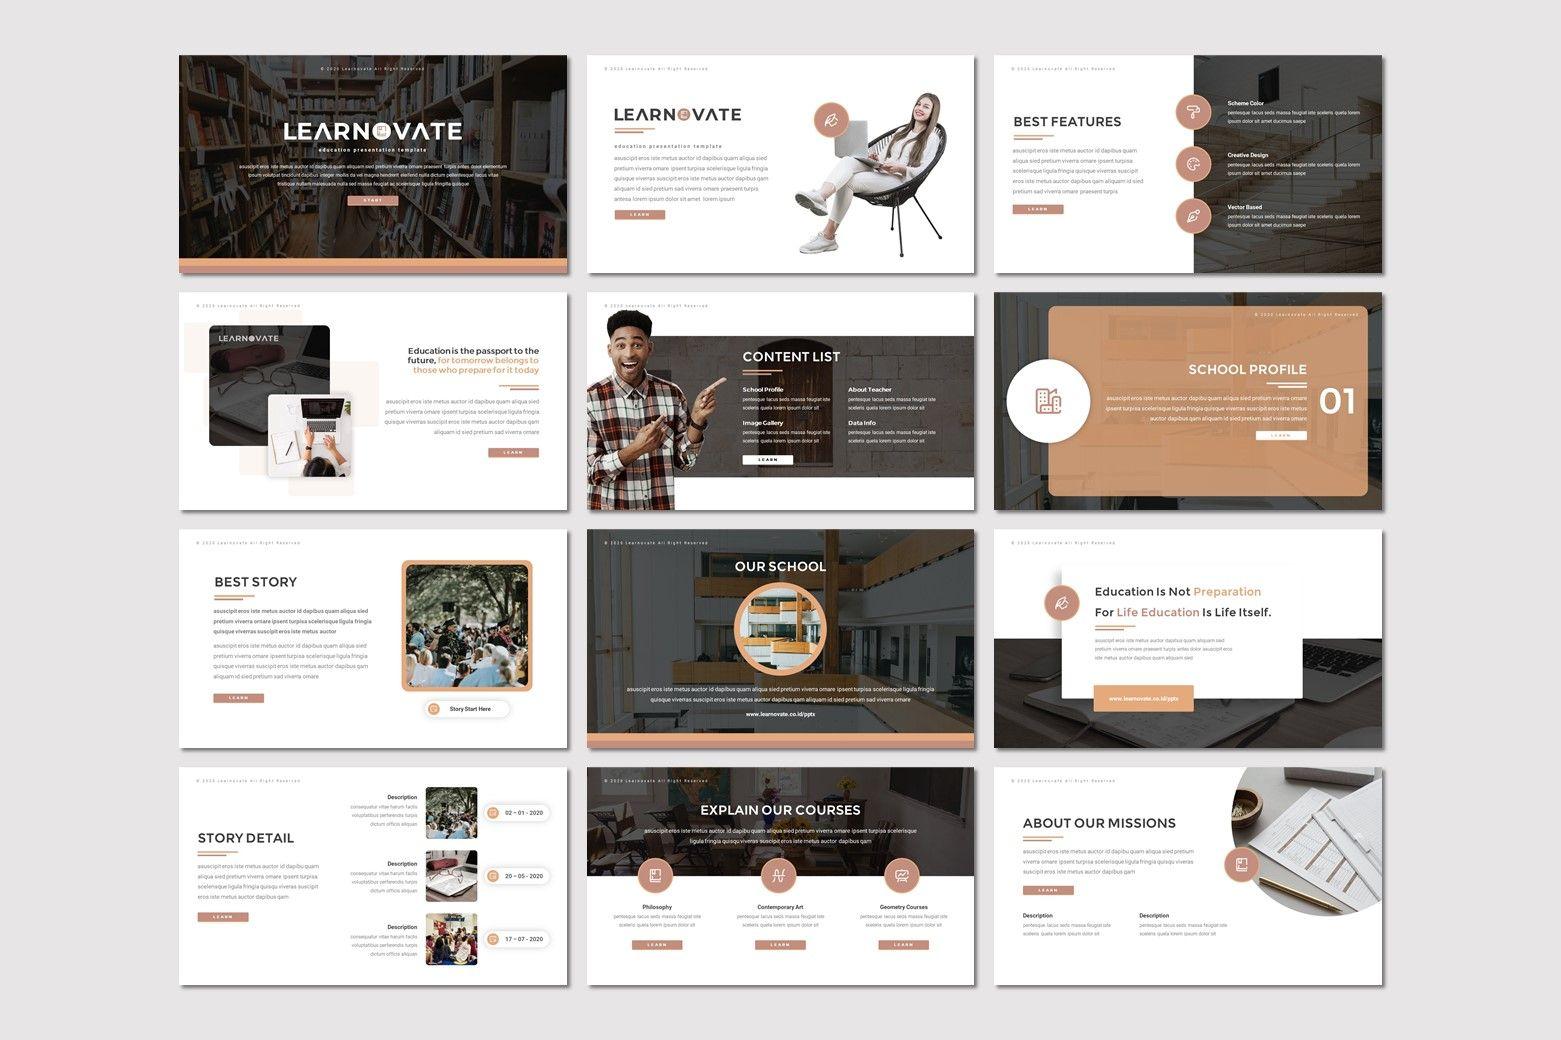 Learnovate - Powerpoint Template, Slide 2, 08033, Presentation Templates — PoweredTemplate.com